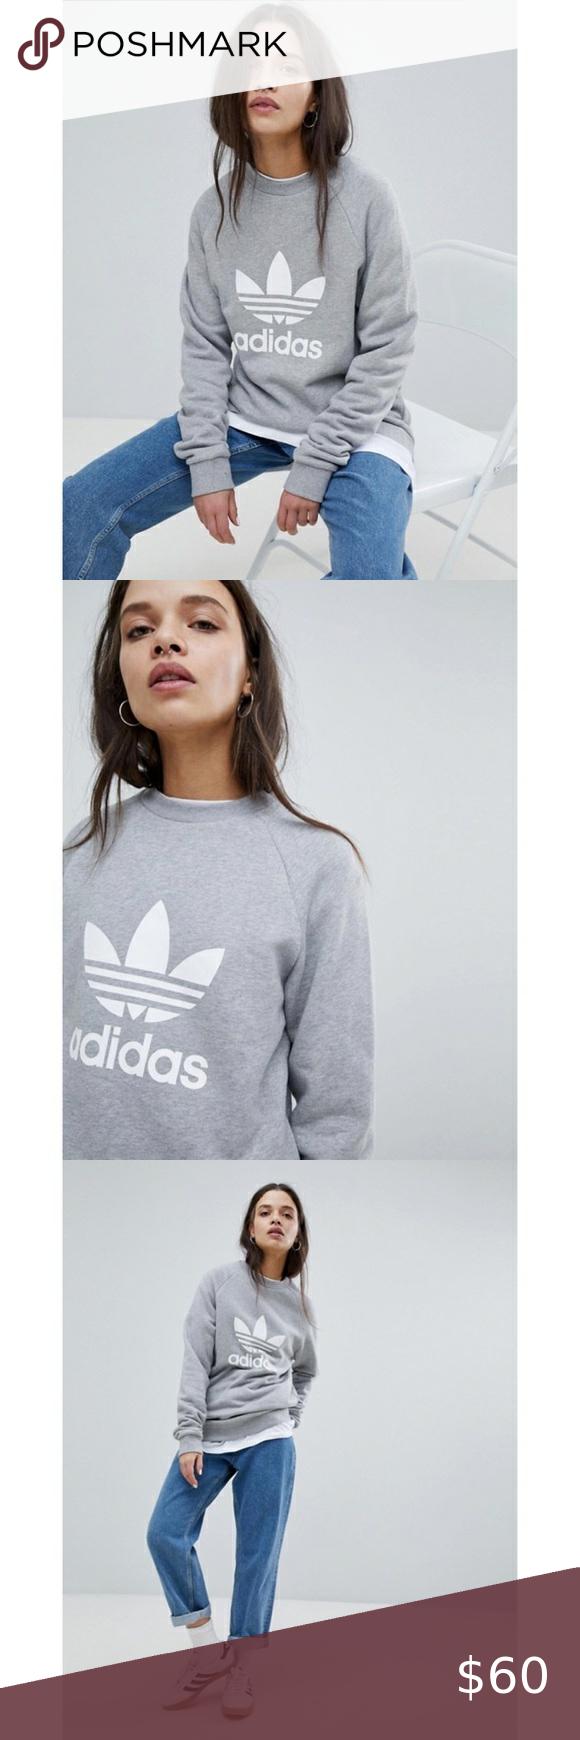 New Adidas Originals Gray Oversized Sweatshirt Grey Adidas Hoodie Adidas Cropped Hoodie Track Pants Women [ 1740 x 580 Pixel ]